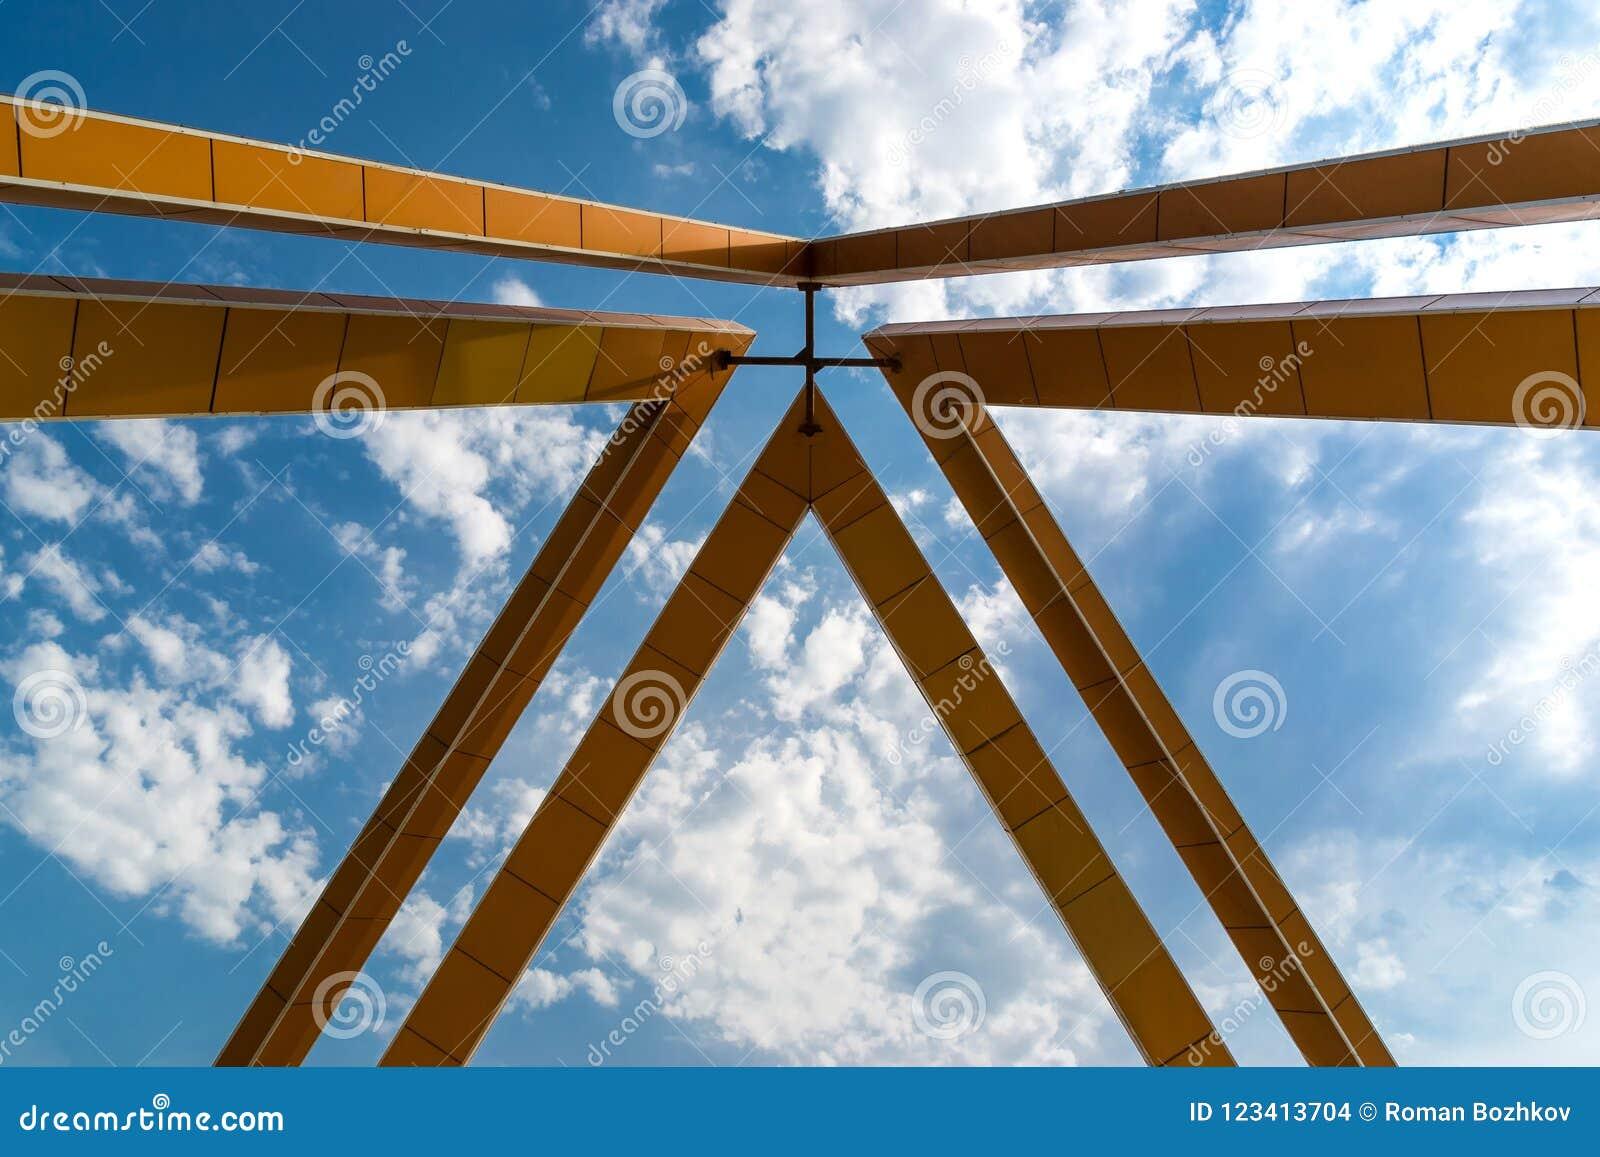 Metal framing against a blue sky.Fragment.